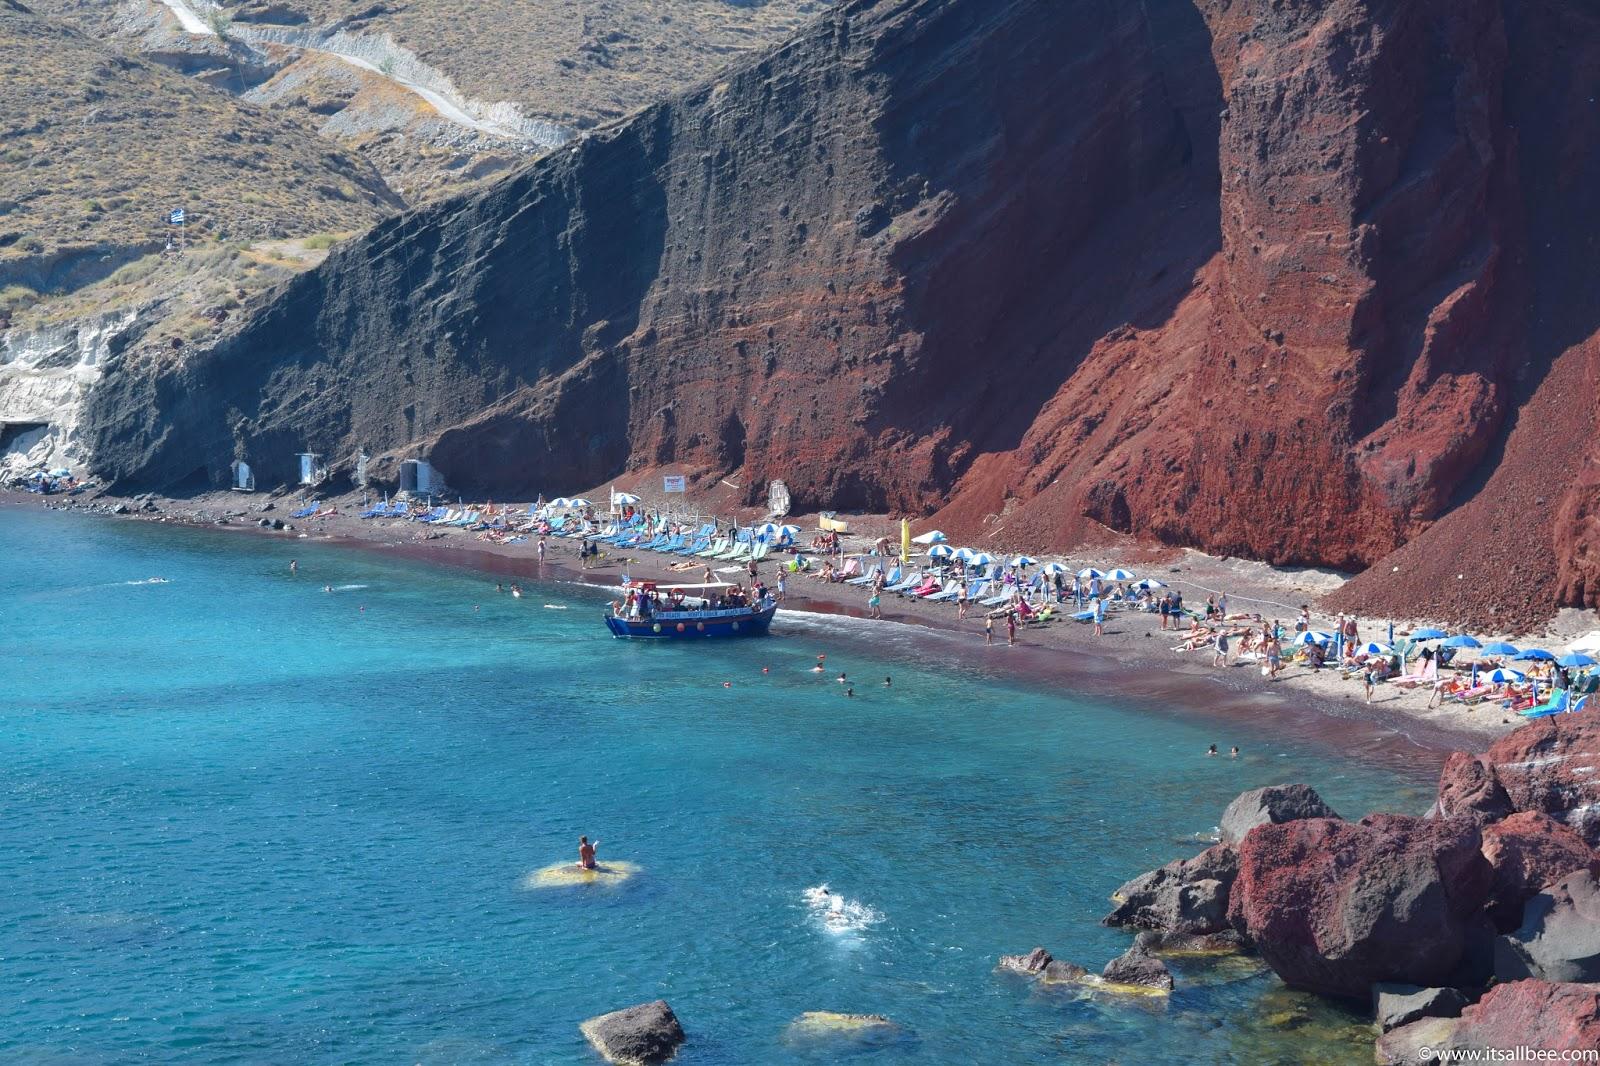 Santorini Beaches | Guide To The Best Beaches In Santorini